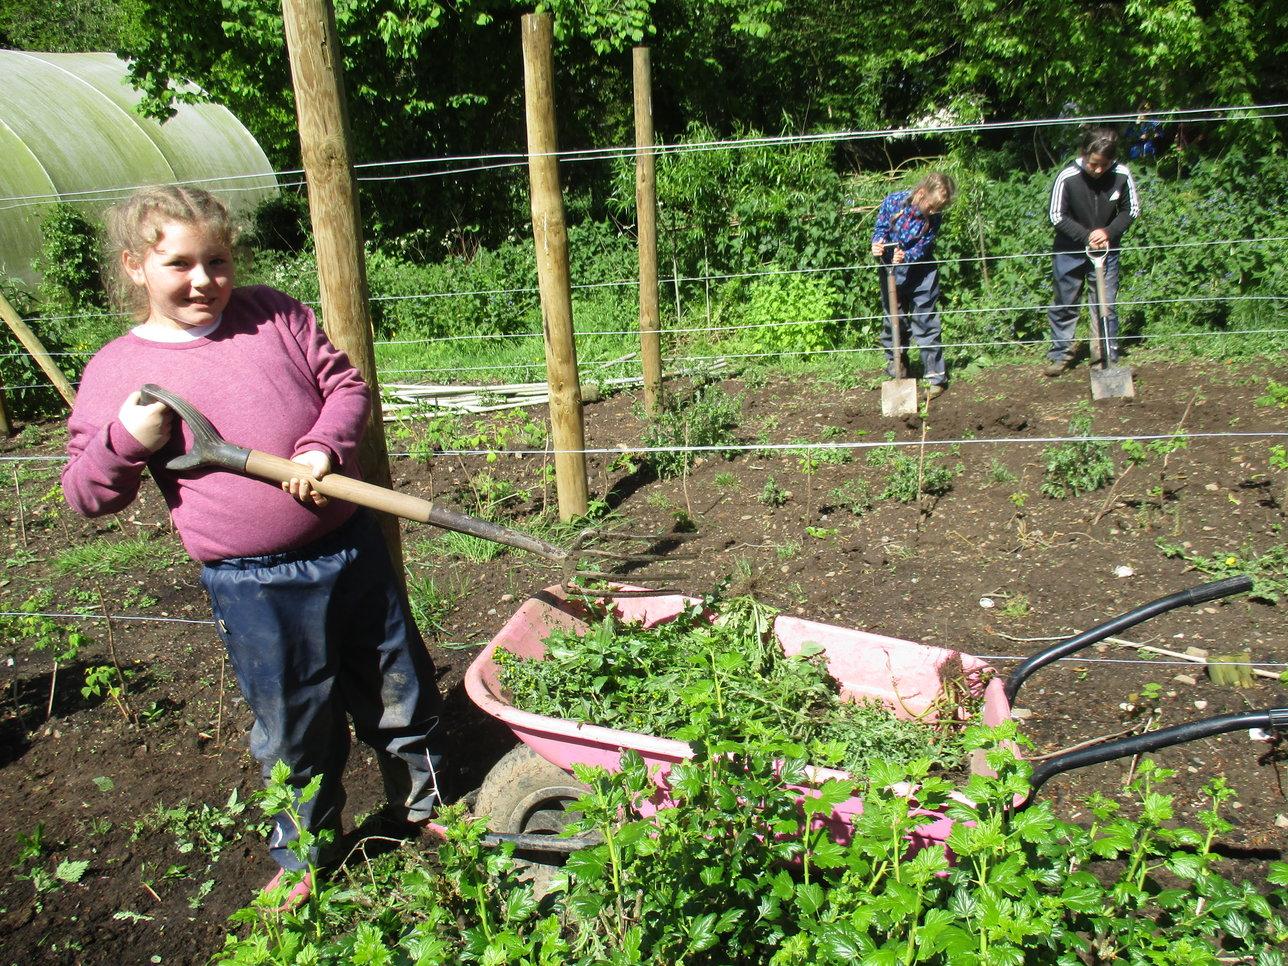 Girl gardening with spade and wheelbarrow